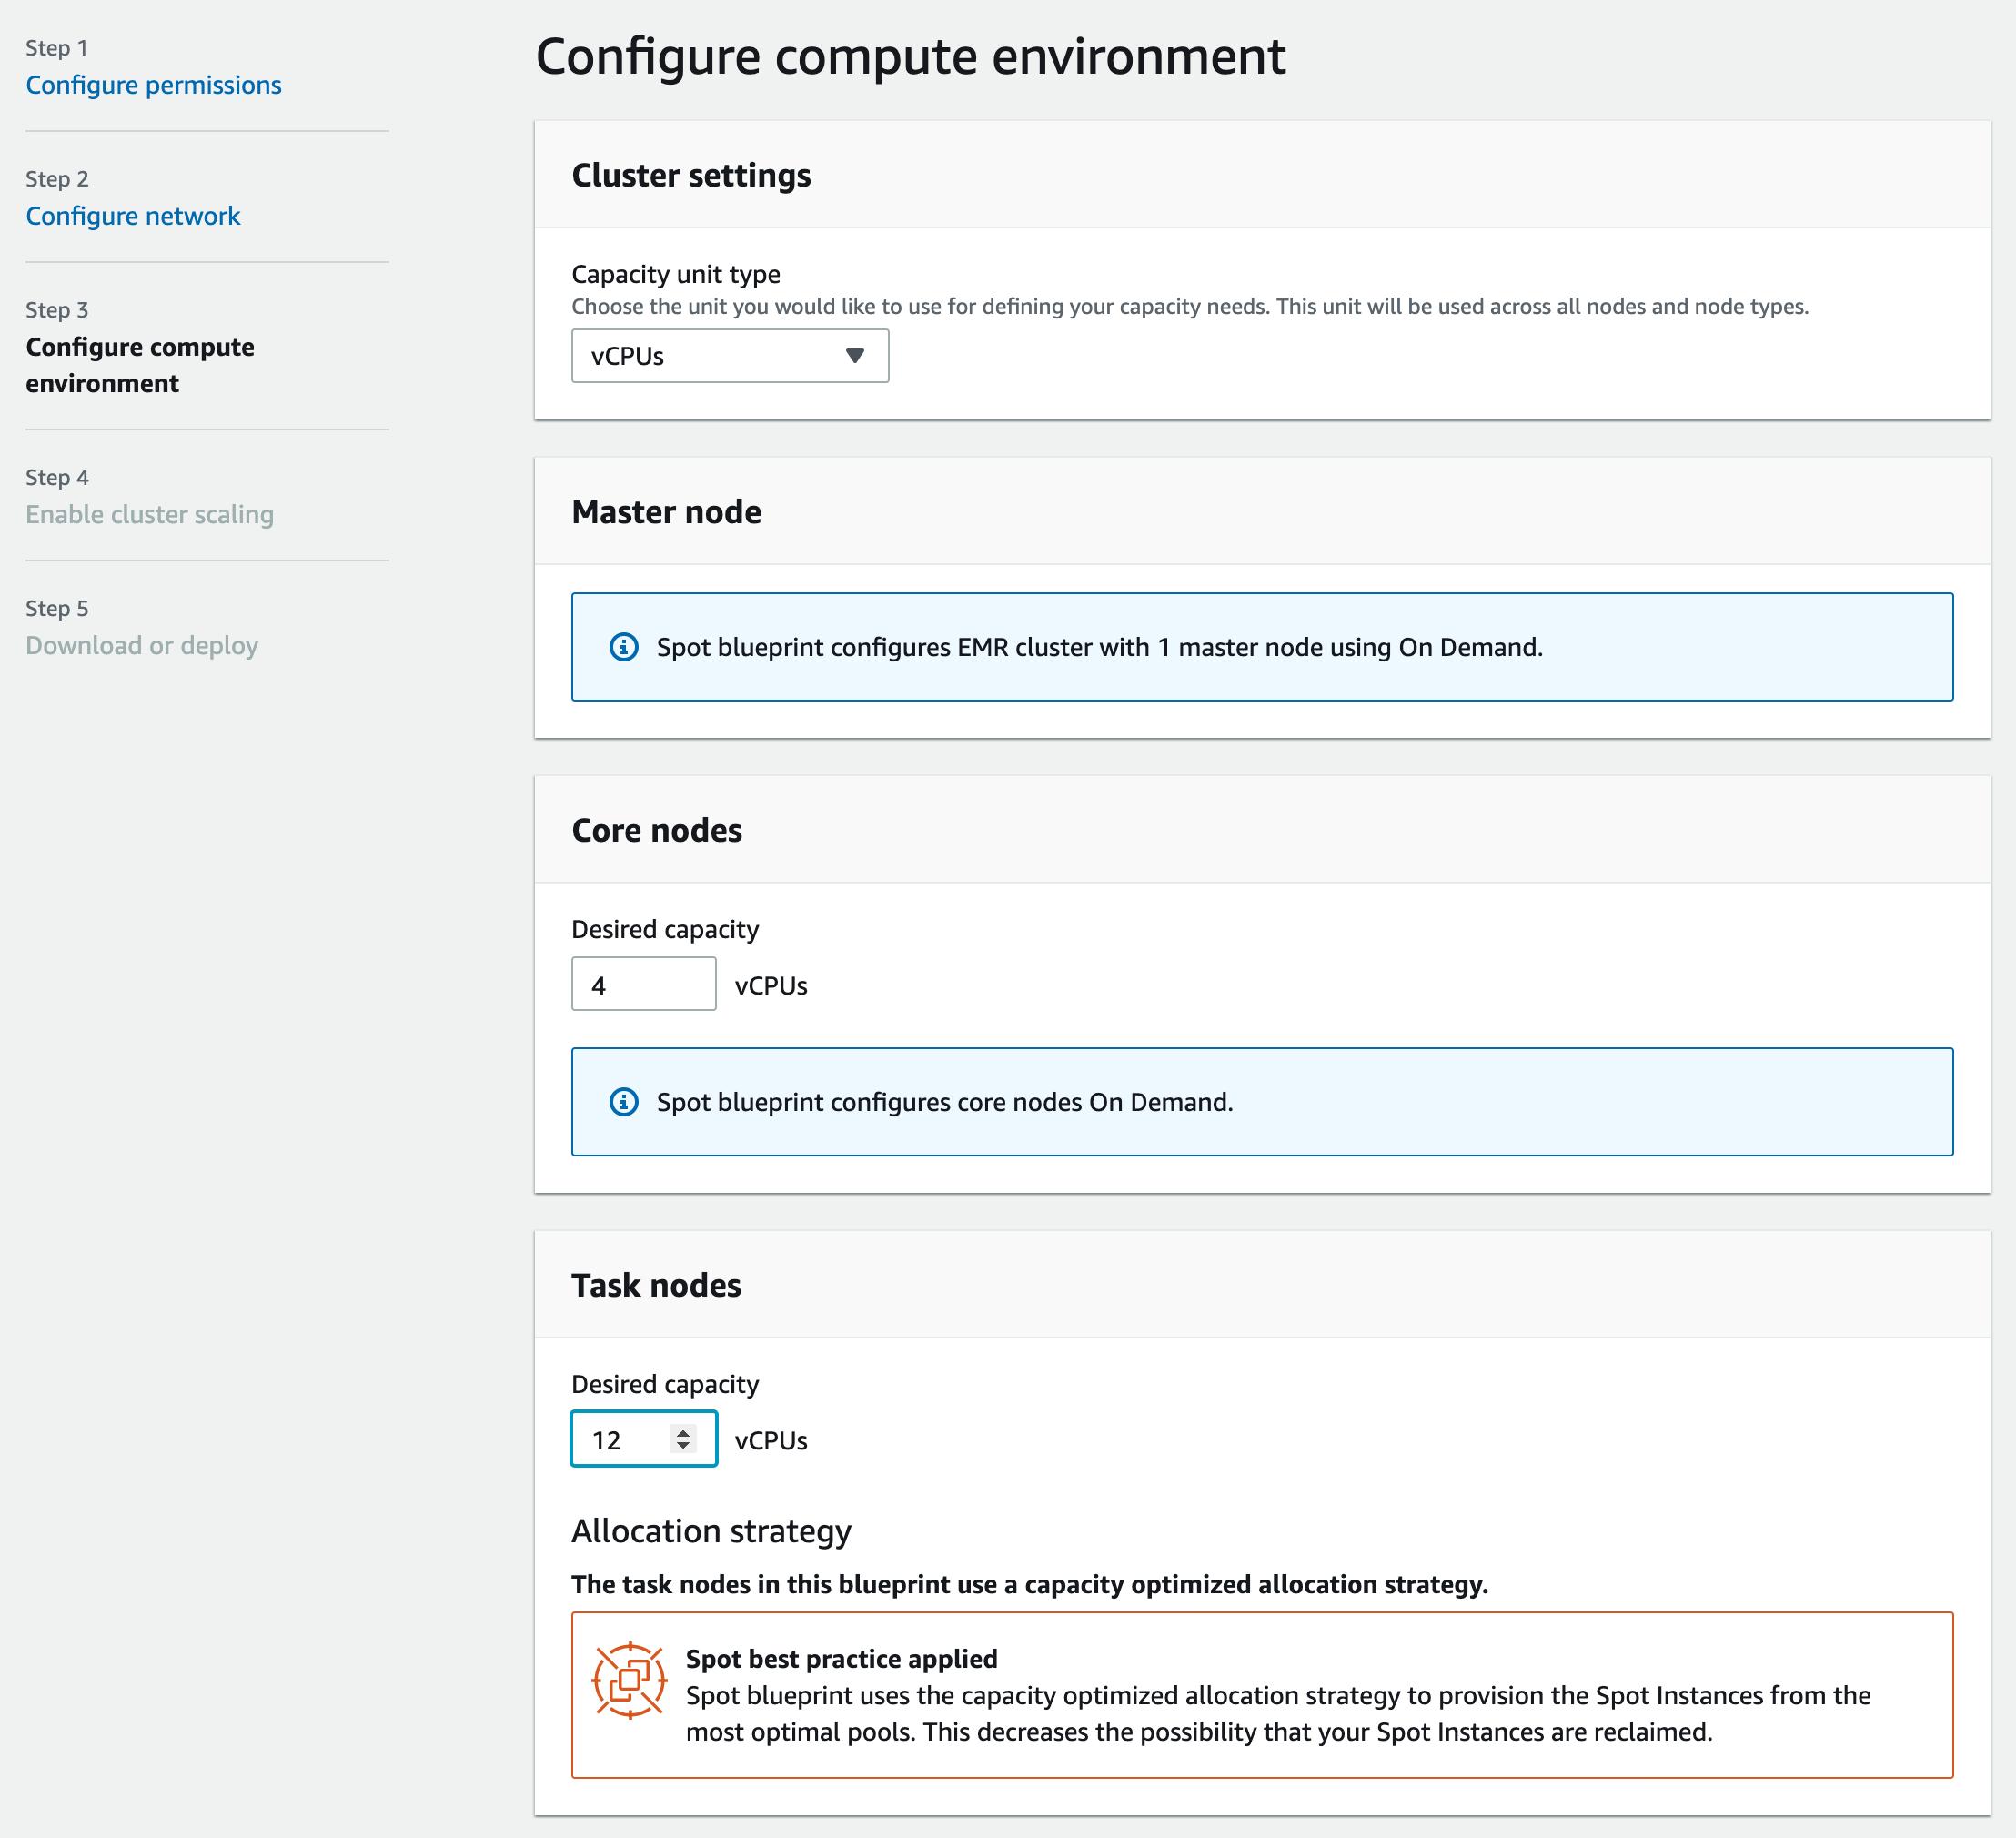 Step 3 configure compute environment